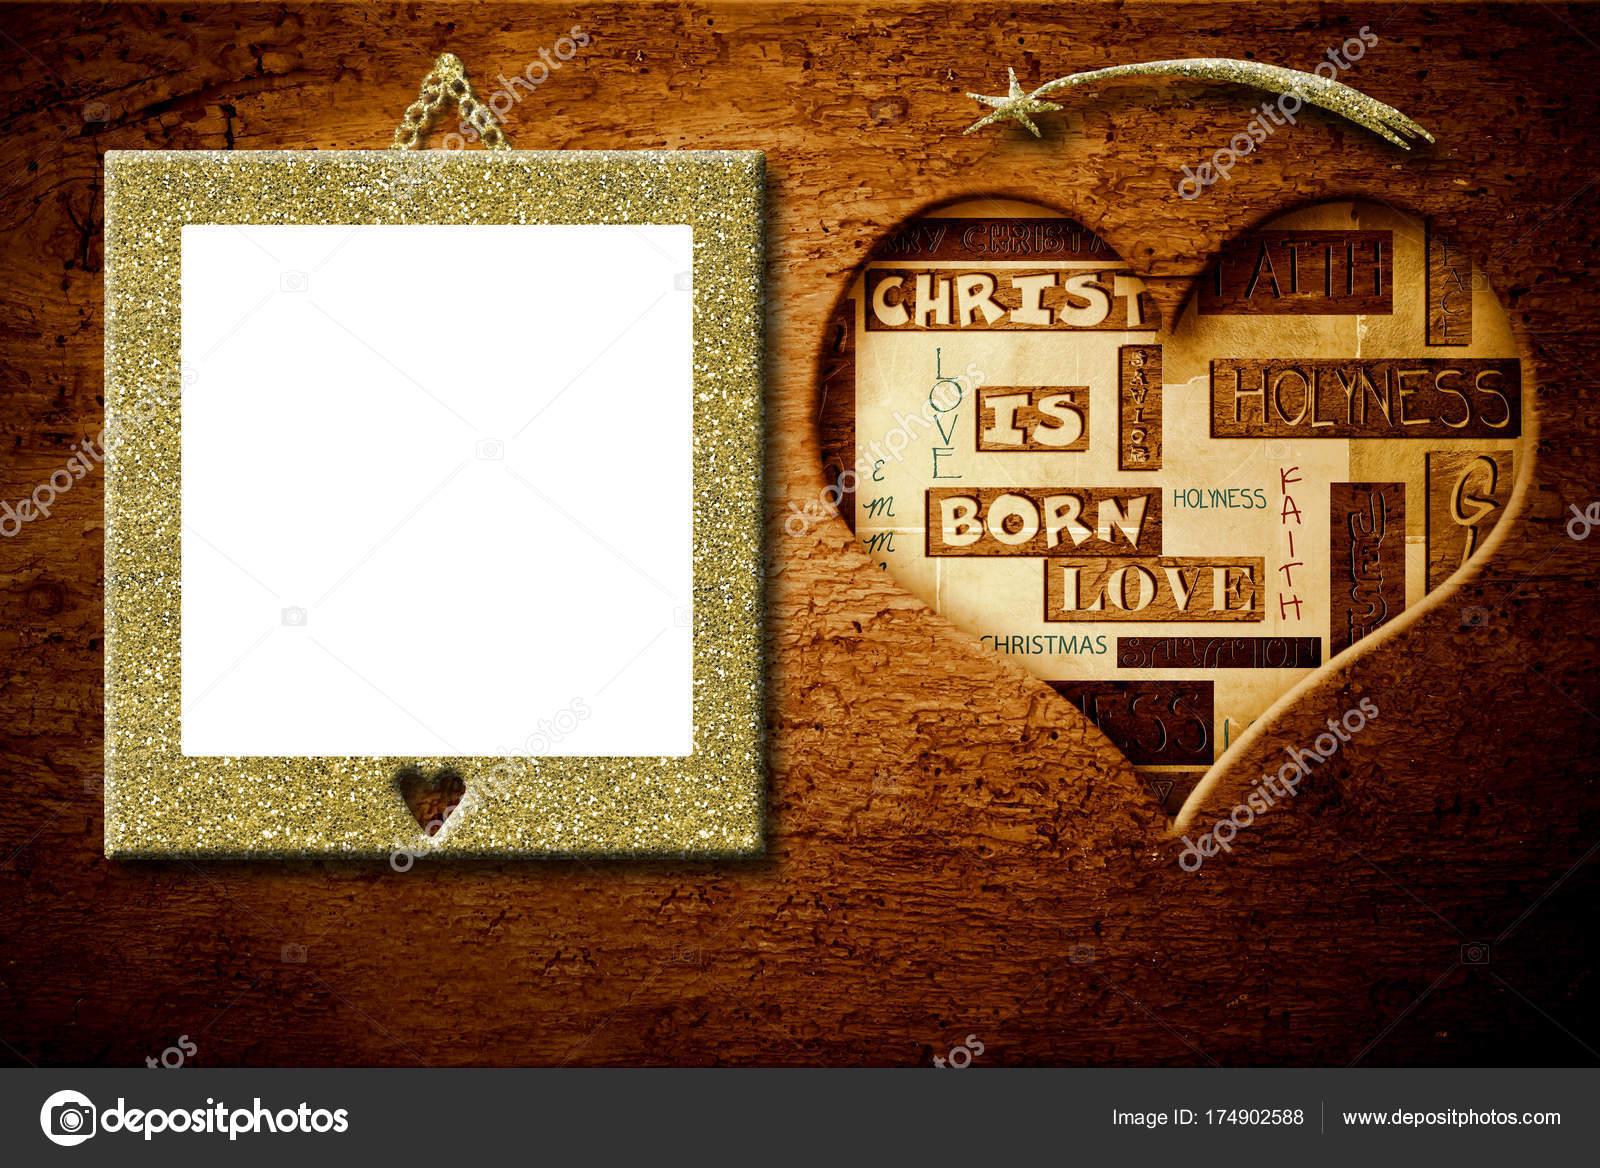 Weihnachten Glückwünsche Bilderrahmen — Stockfoto © Risia #174902588